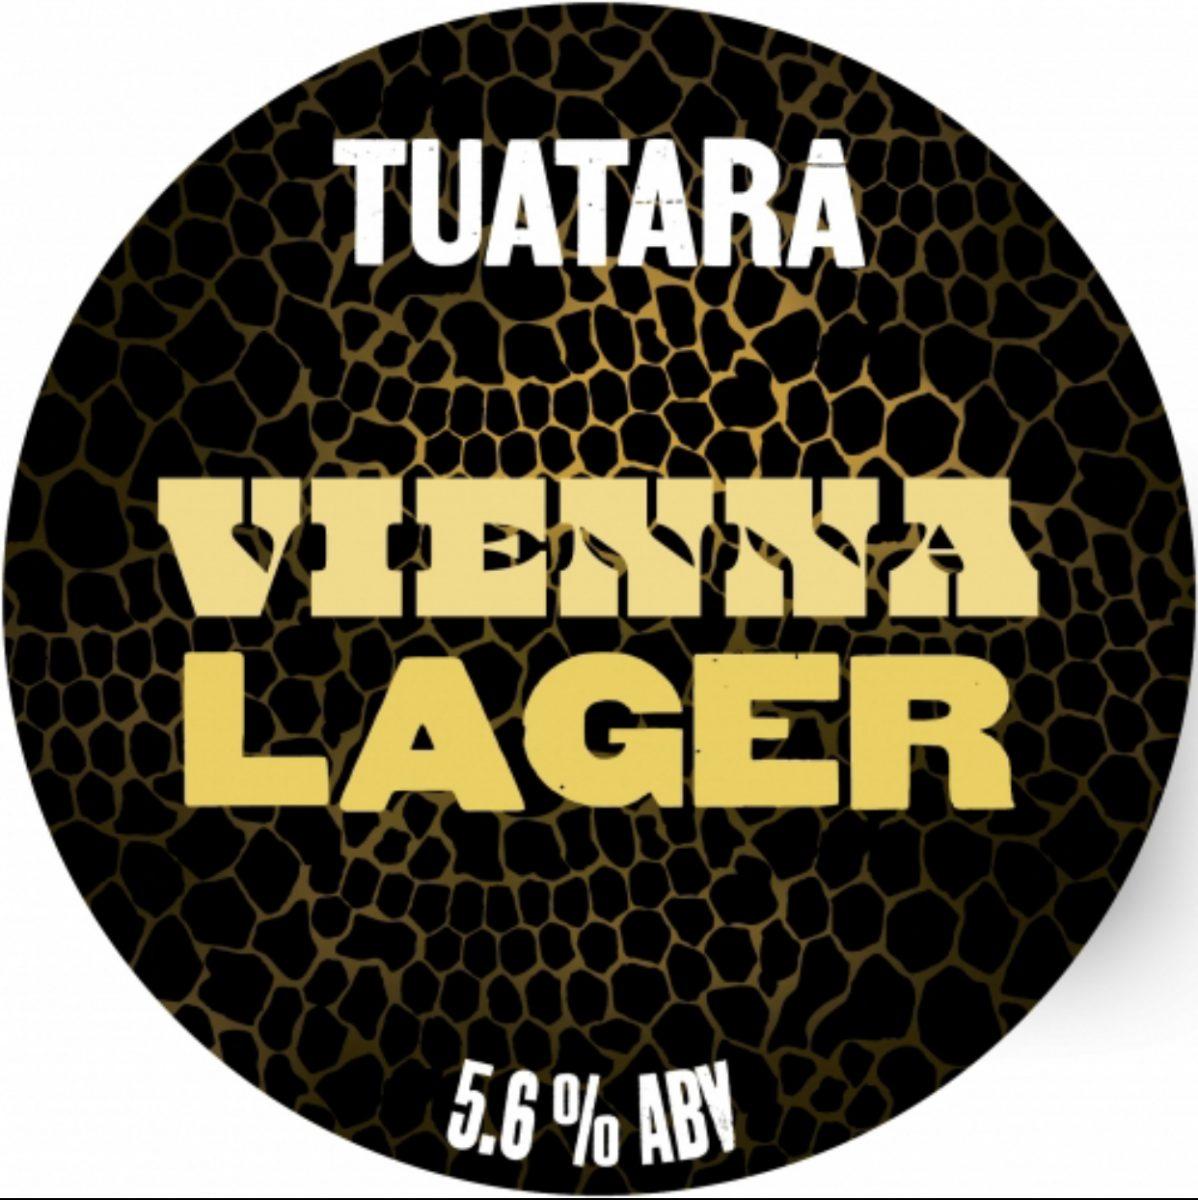 tuatara-vienna-lager-asian-craft-beer-nz-beer-beernz-local-pub-best-bar-faringdon-rolleston-selwyn